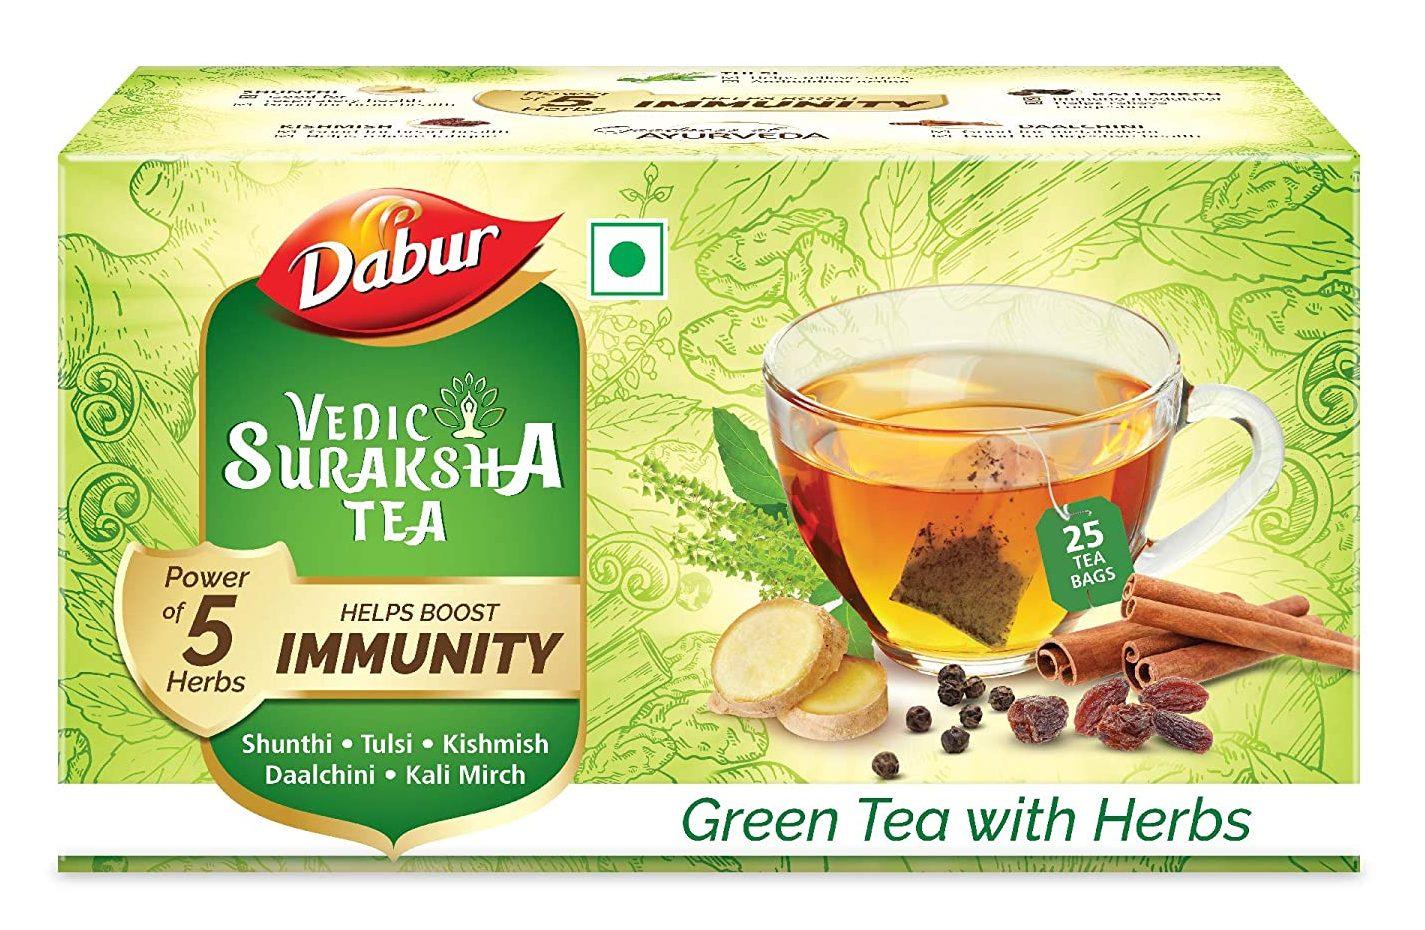 Dabur Vedic Suraksha Green Tea